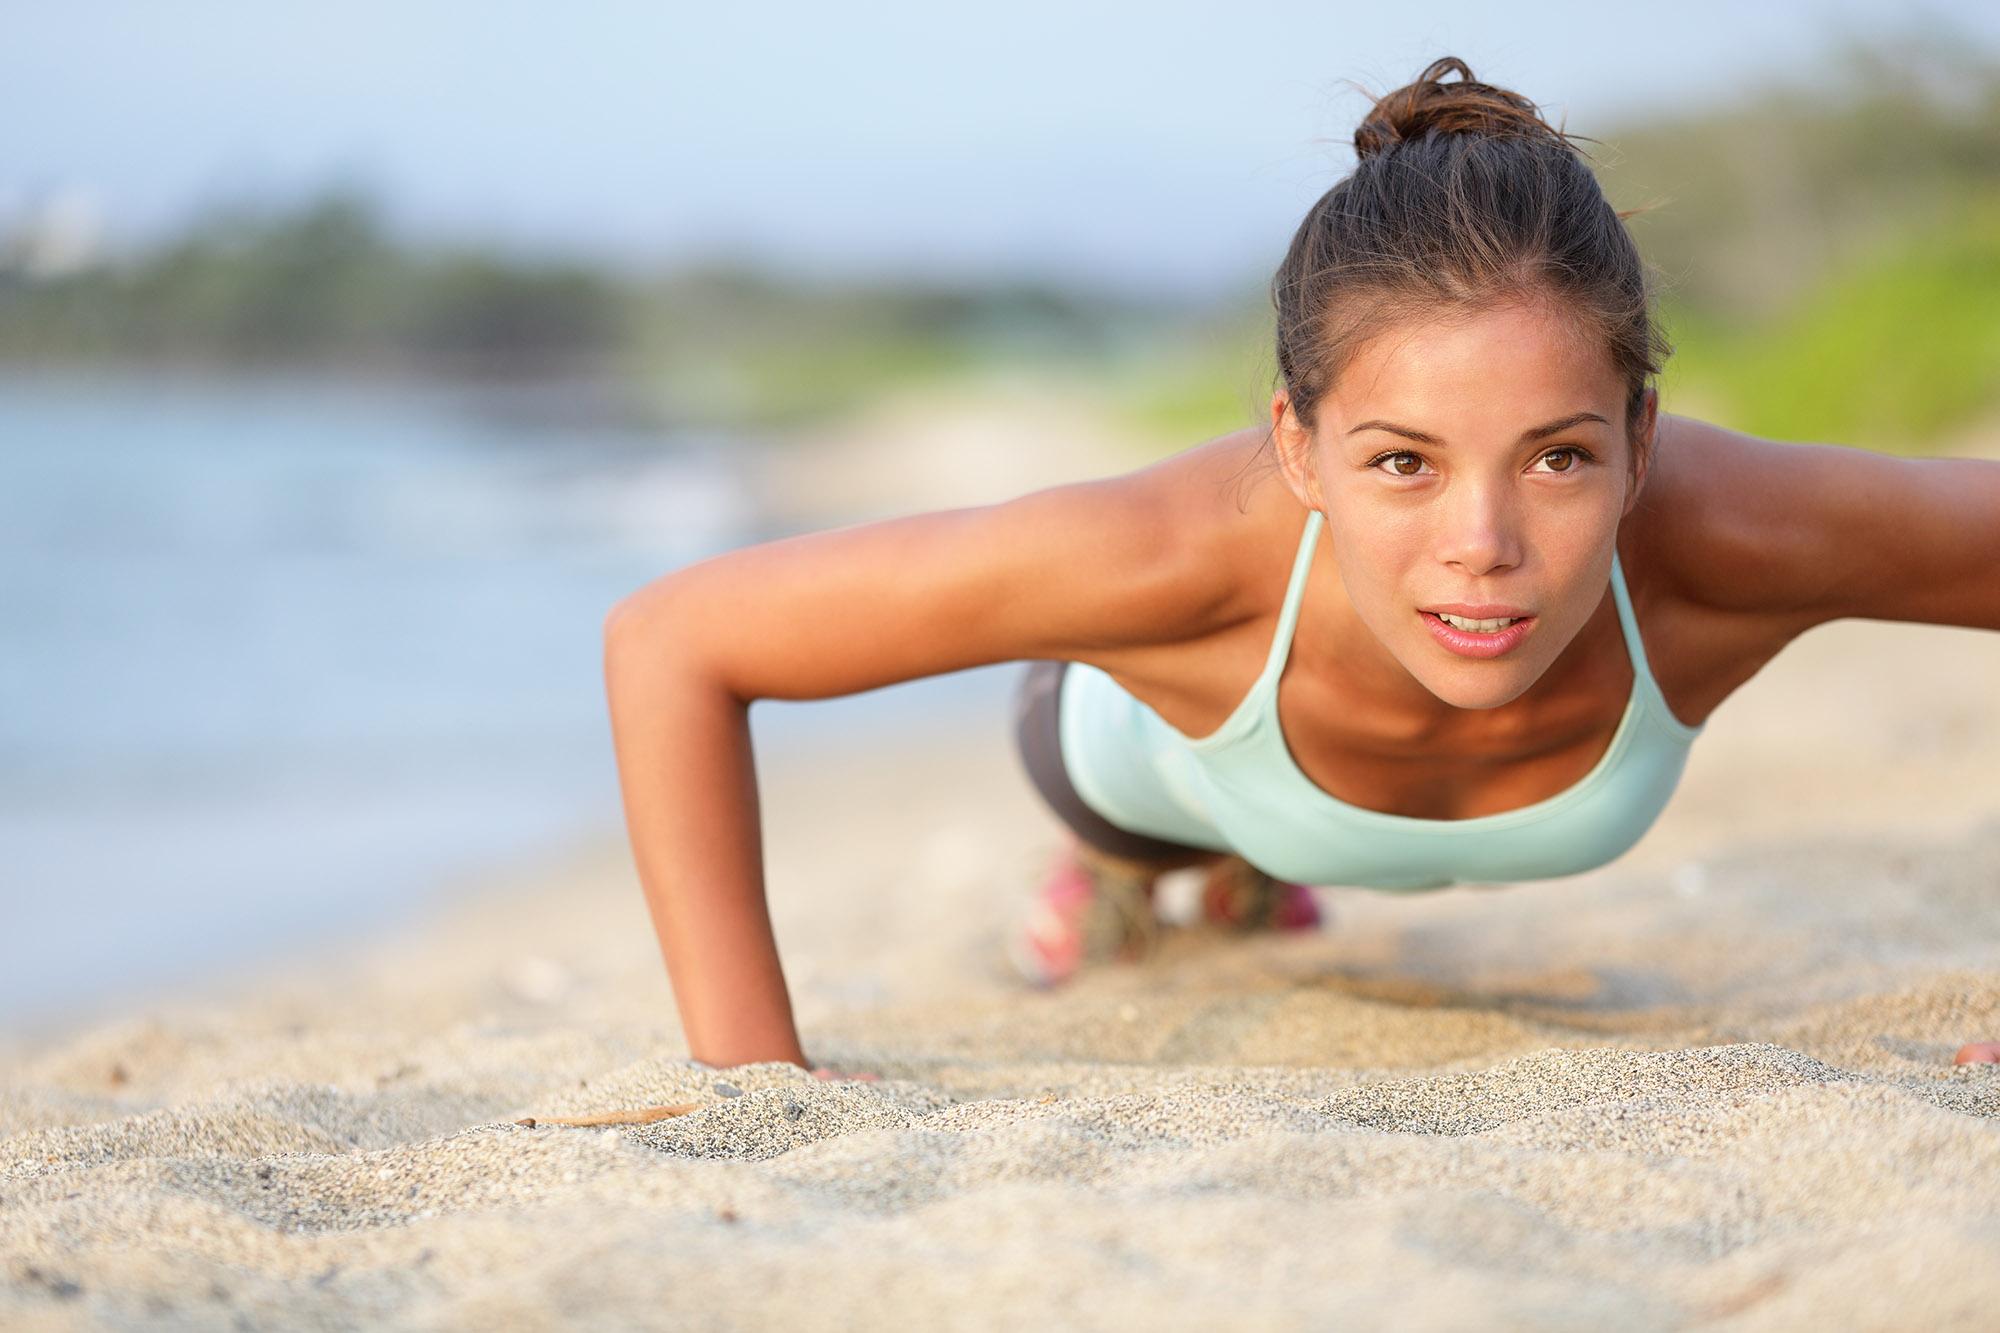 bigstock-Push-ups-fitness-woman-doing-p-45657850.jpg